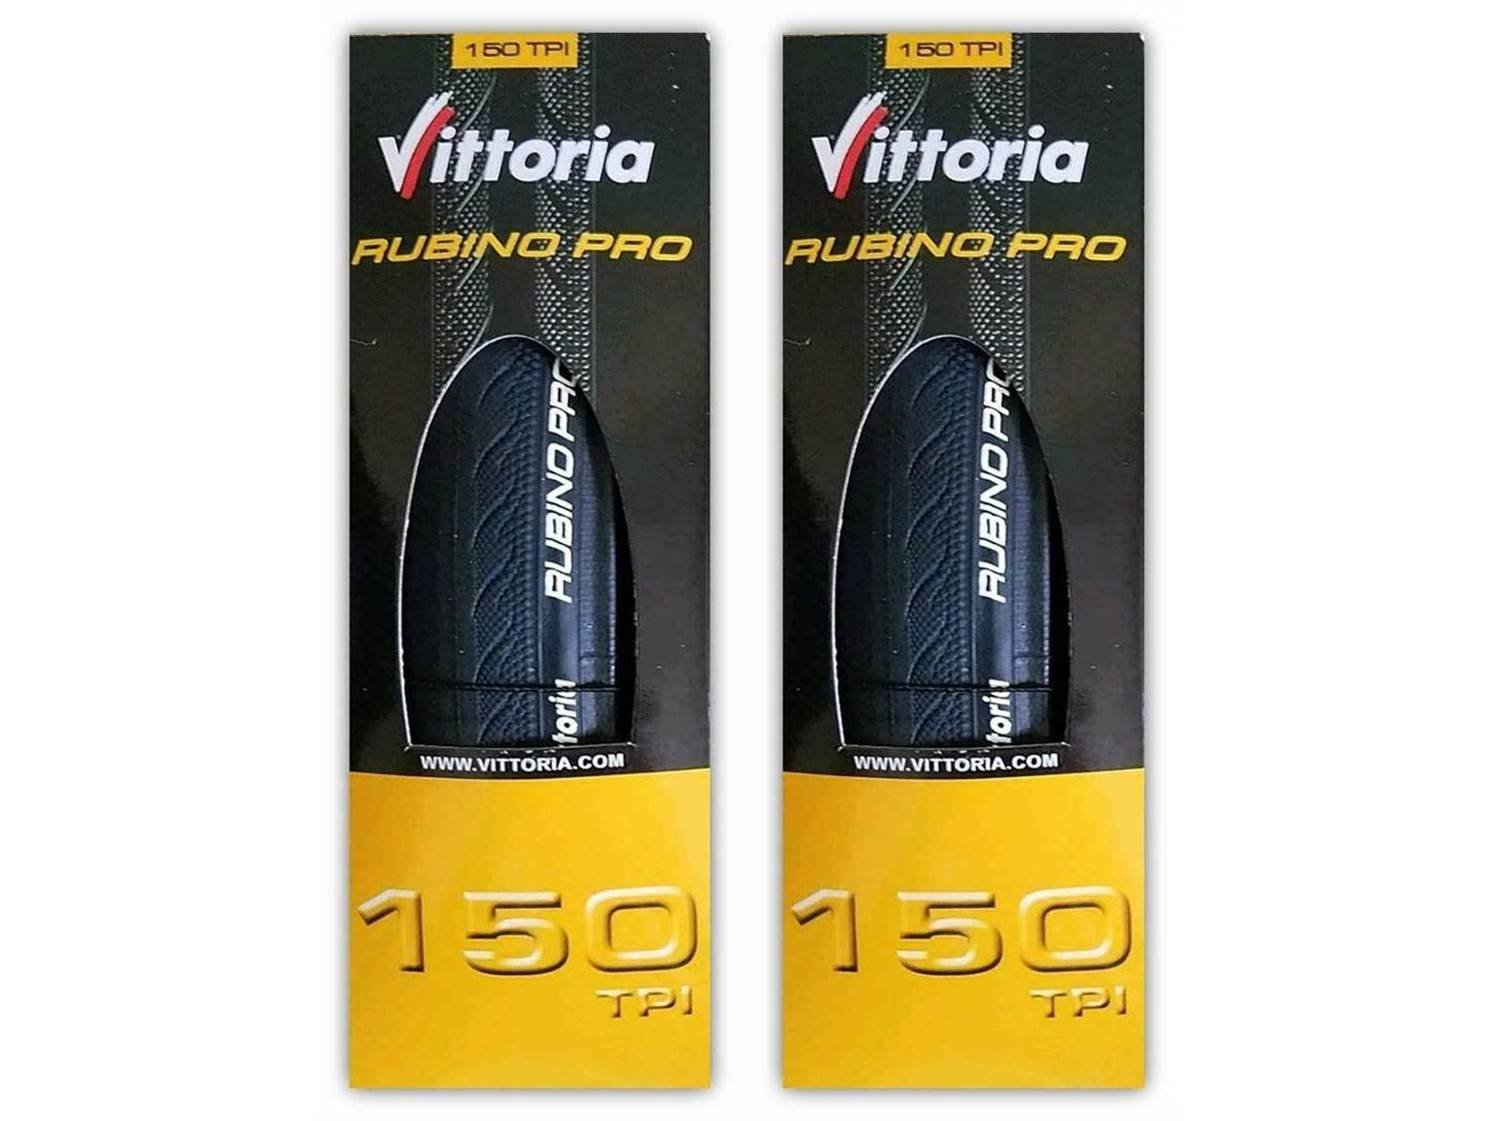 Vittoria Rubino Pro III 700x23c Black Road Bike Tire Bundle - PAIR (2 TIRES)